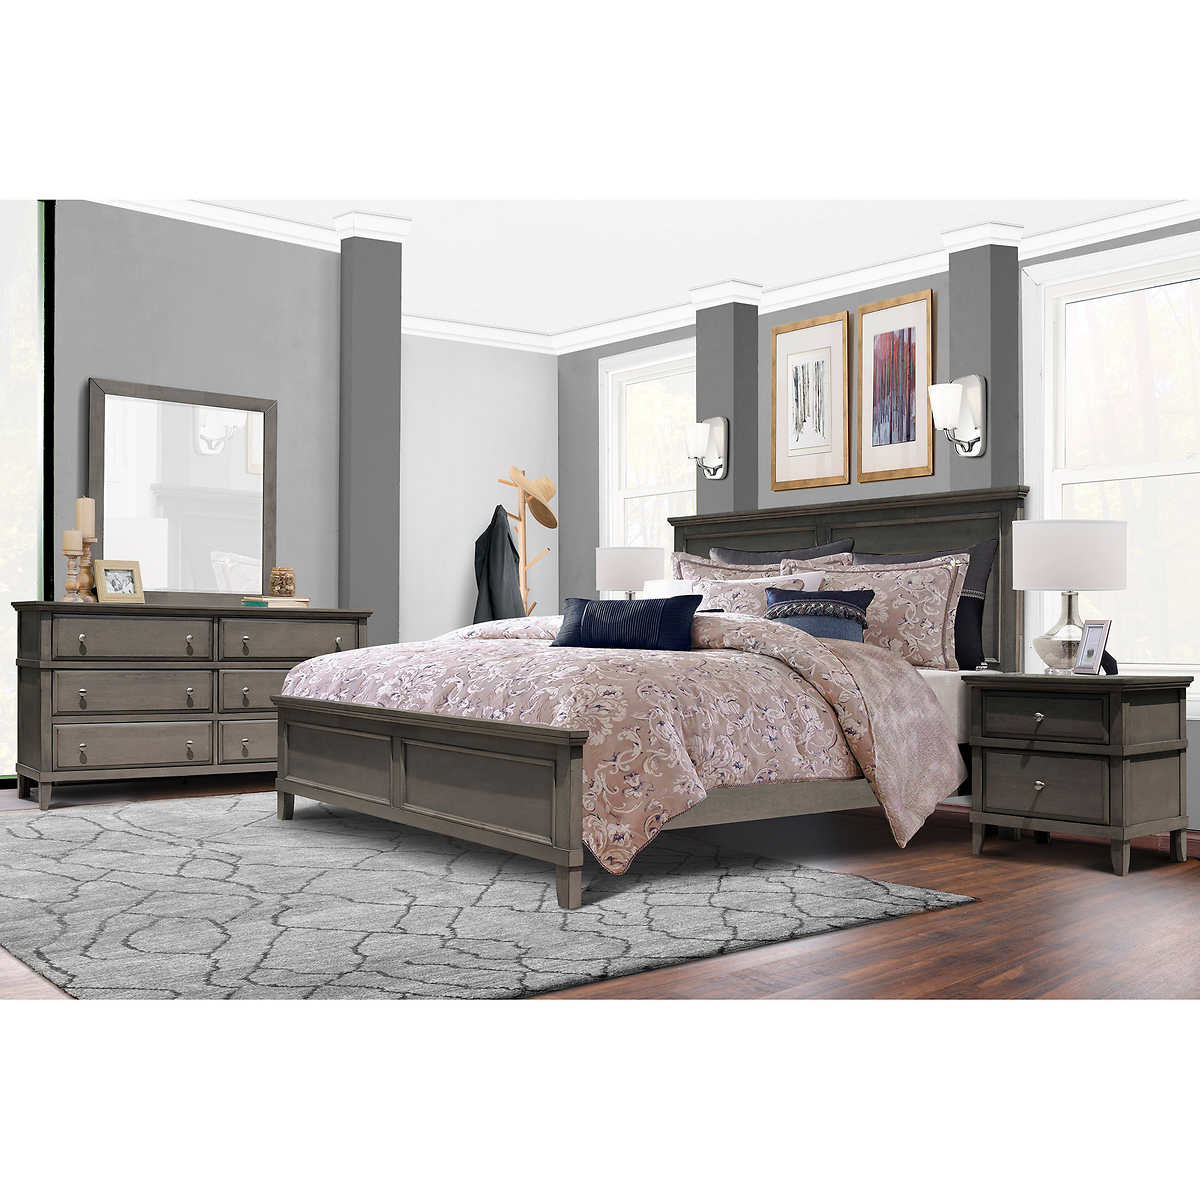 Auburn 5-piece King Bedroom Set